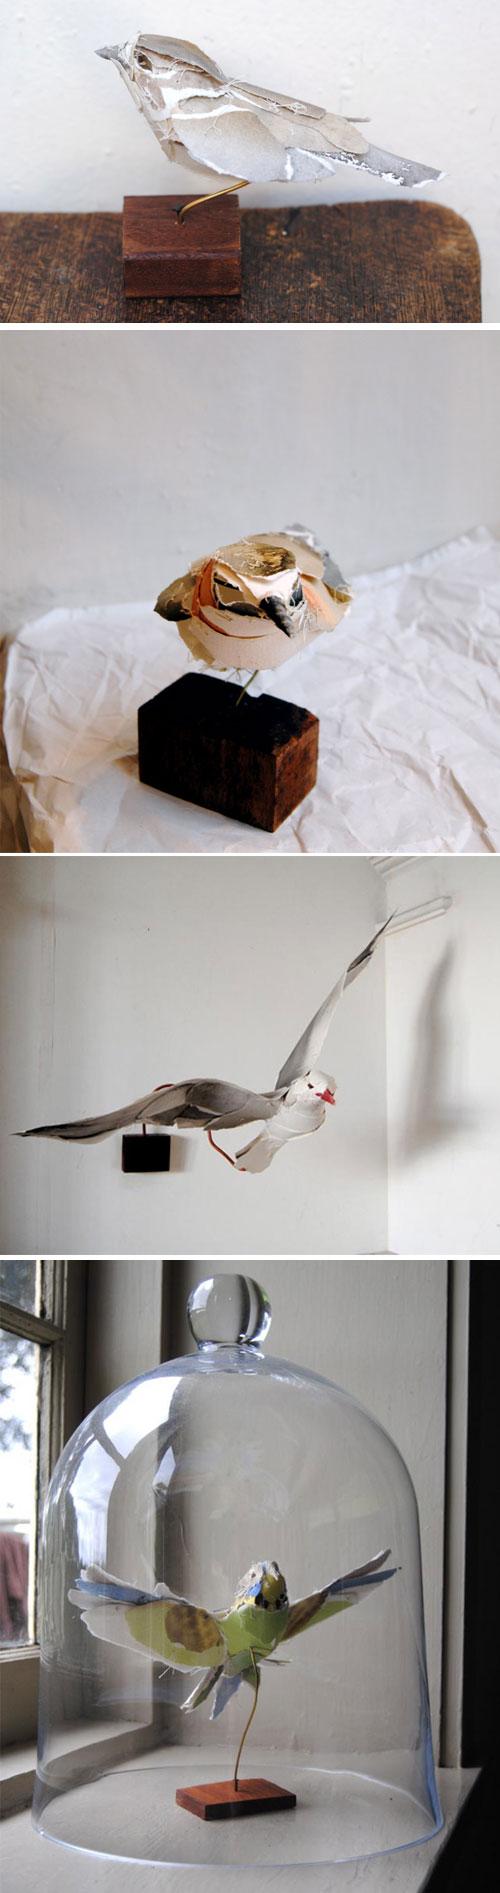 Anna-Willi-birds